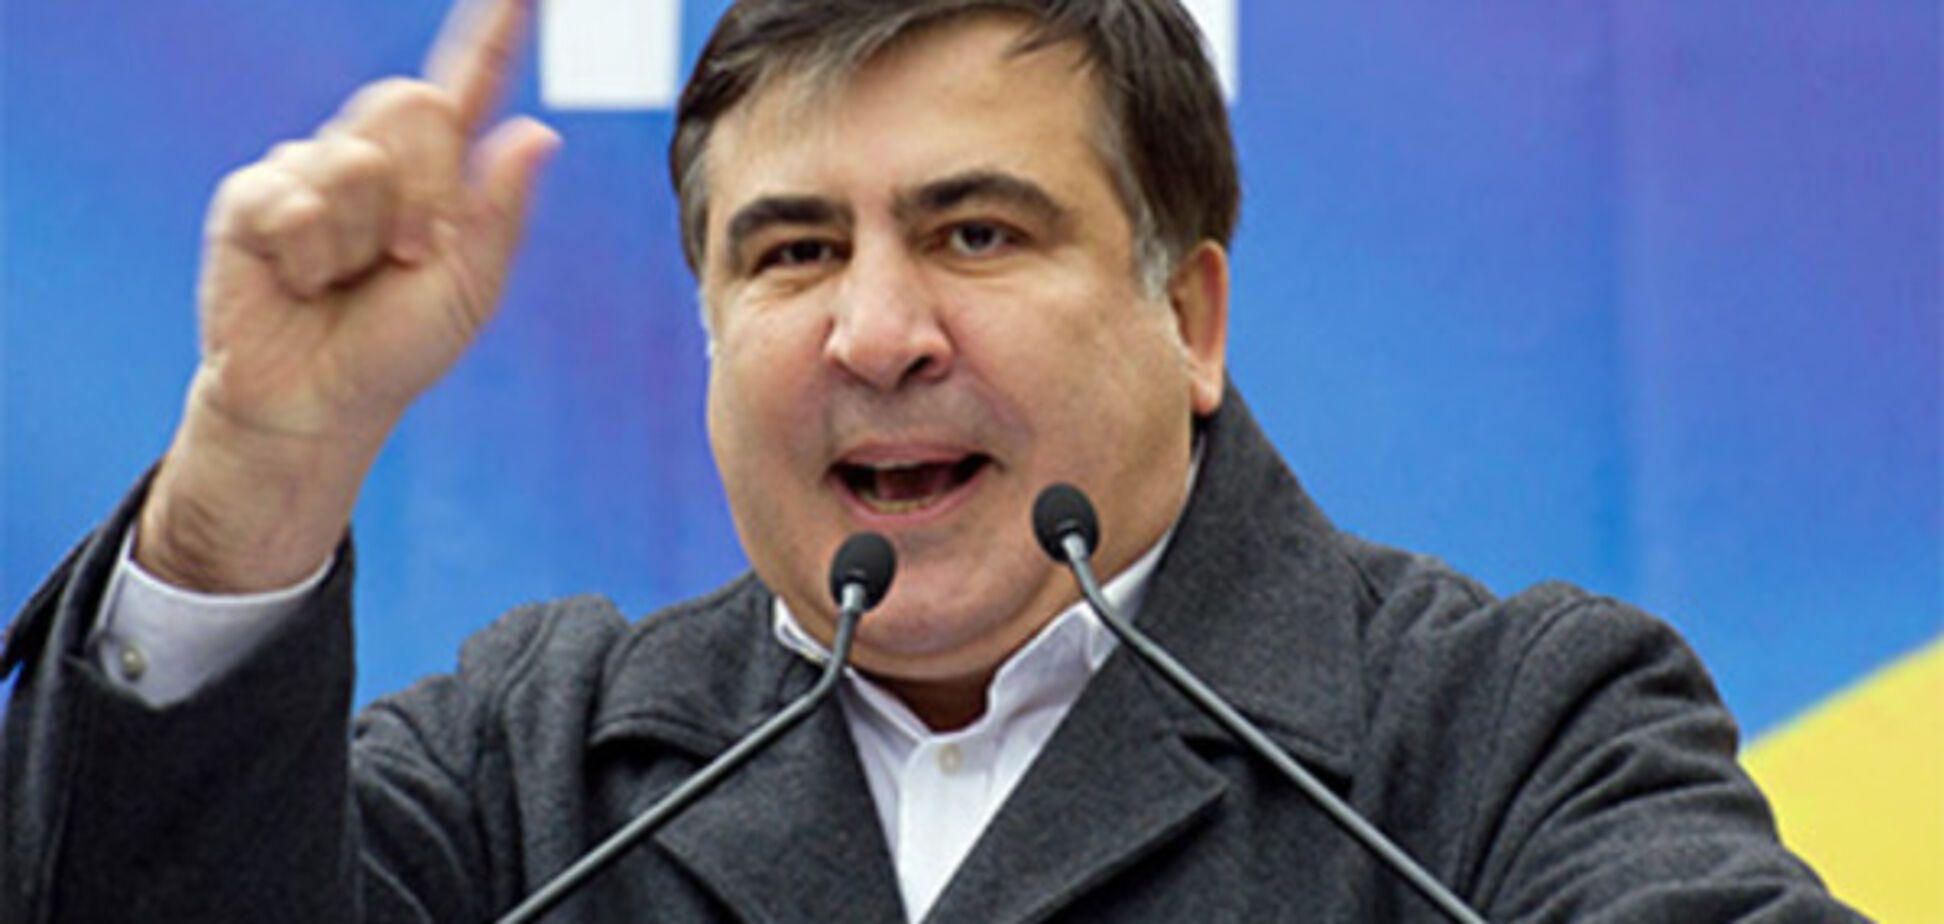 Закария Куцнашвили: Саакашвили – обманщик и авантюрист международного уровня